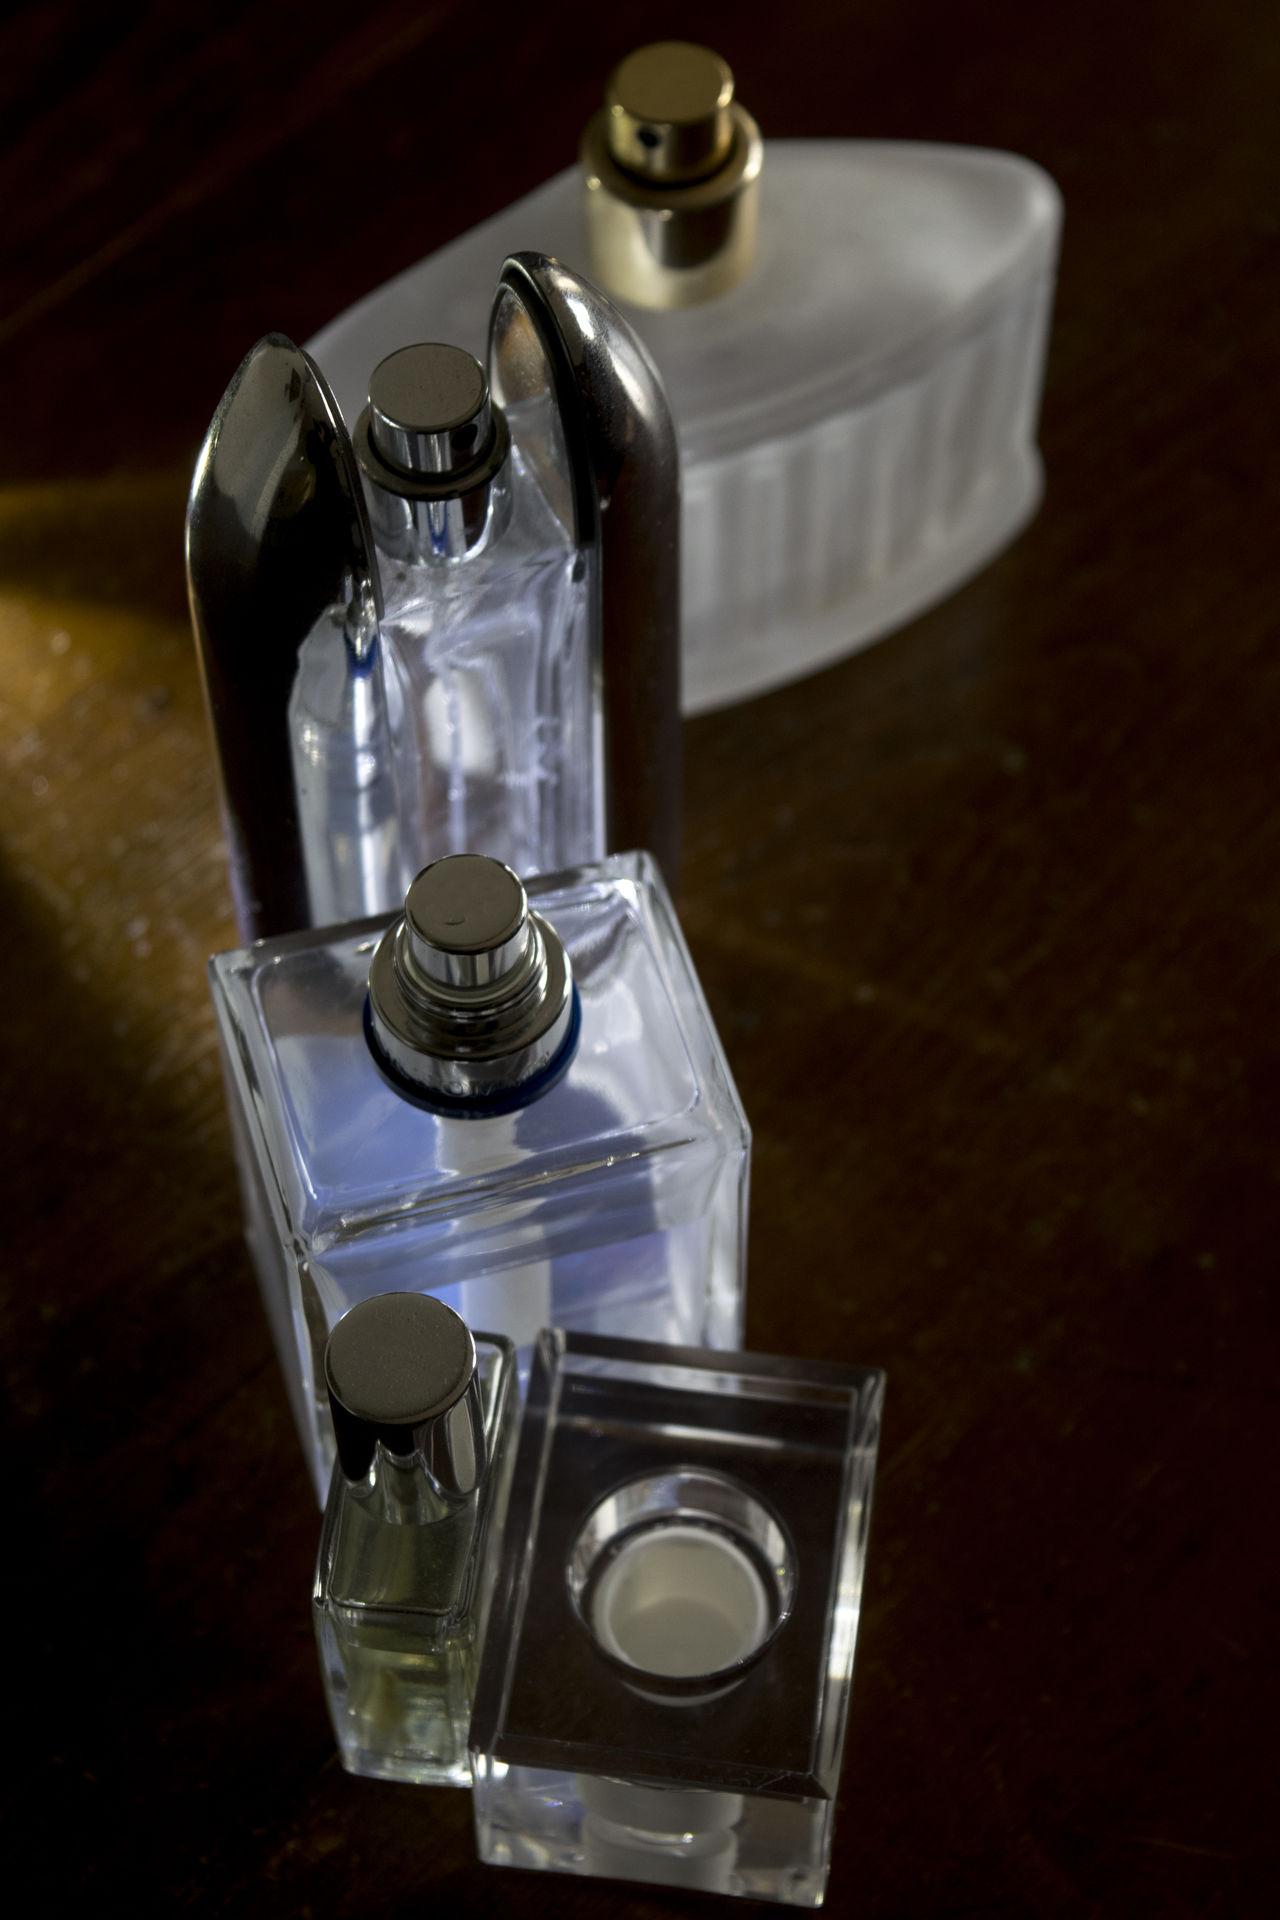 glass bottles of perfume with unusual light Appeal Beauty Bottle Charm Feminine  Feminity Glass Make Up Perfume